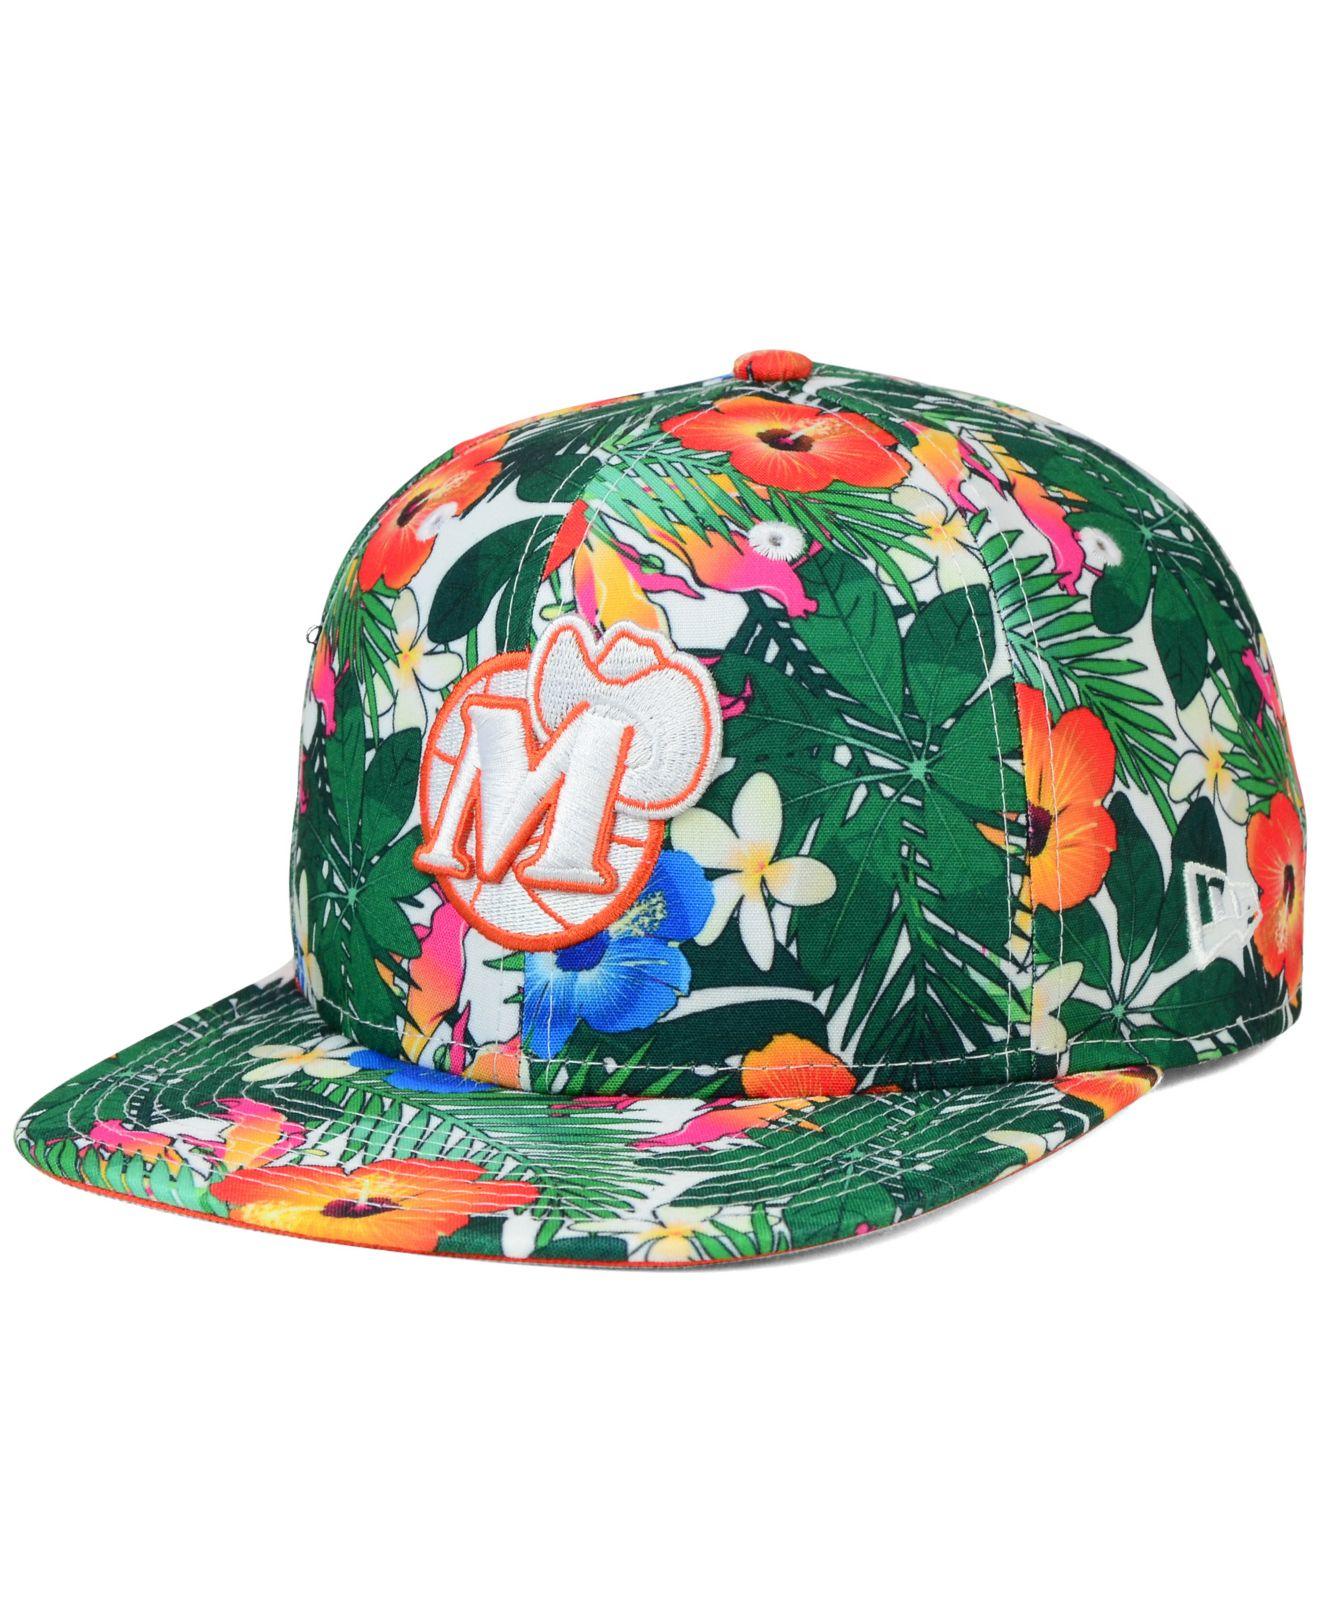 hot sale online 97119 ad63c Lyst - KTZ Dallas Mavericks Hwc Light Floral 9fifty Snapback Cap in ...